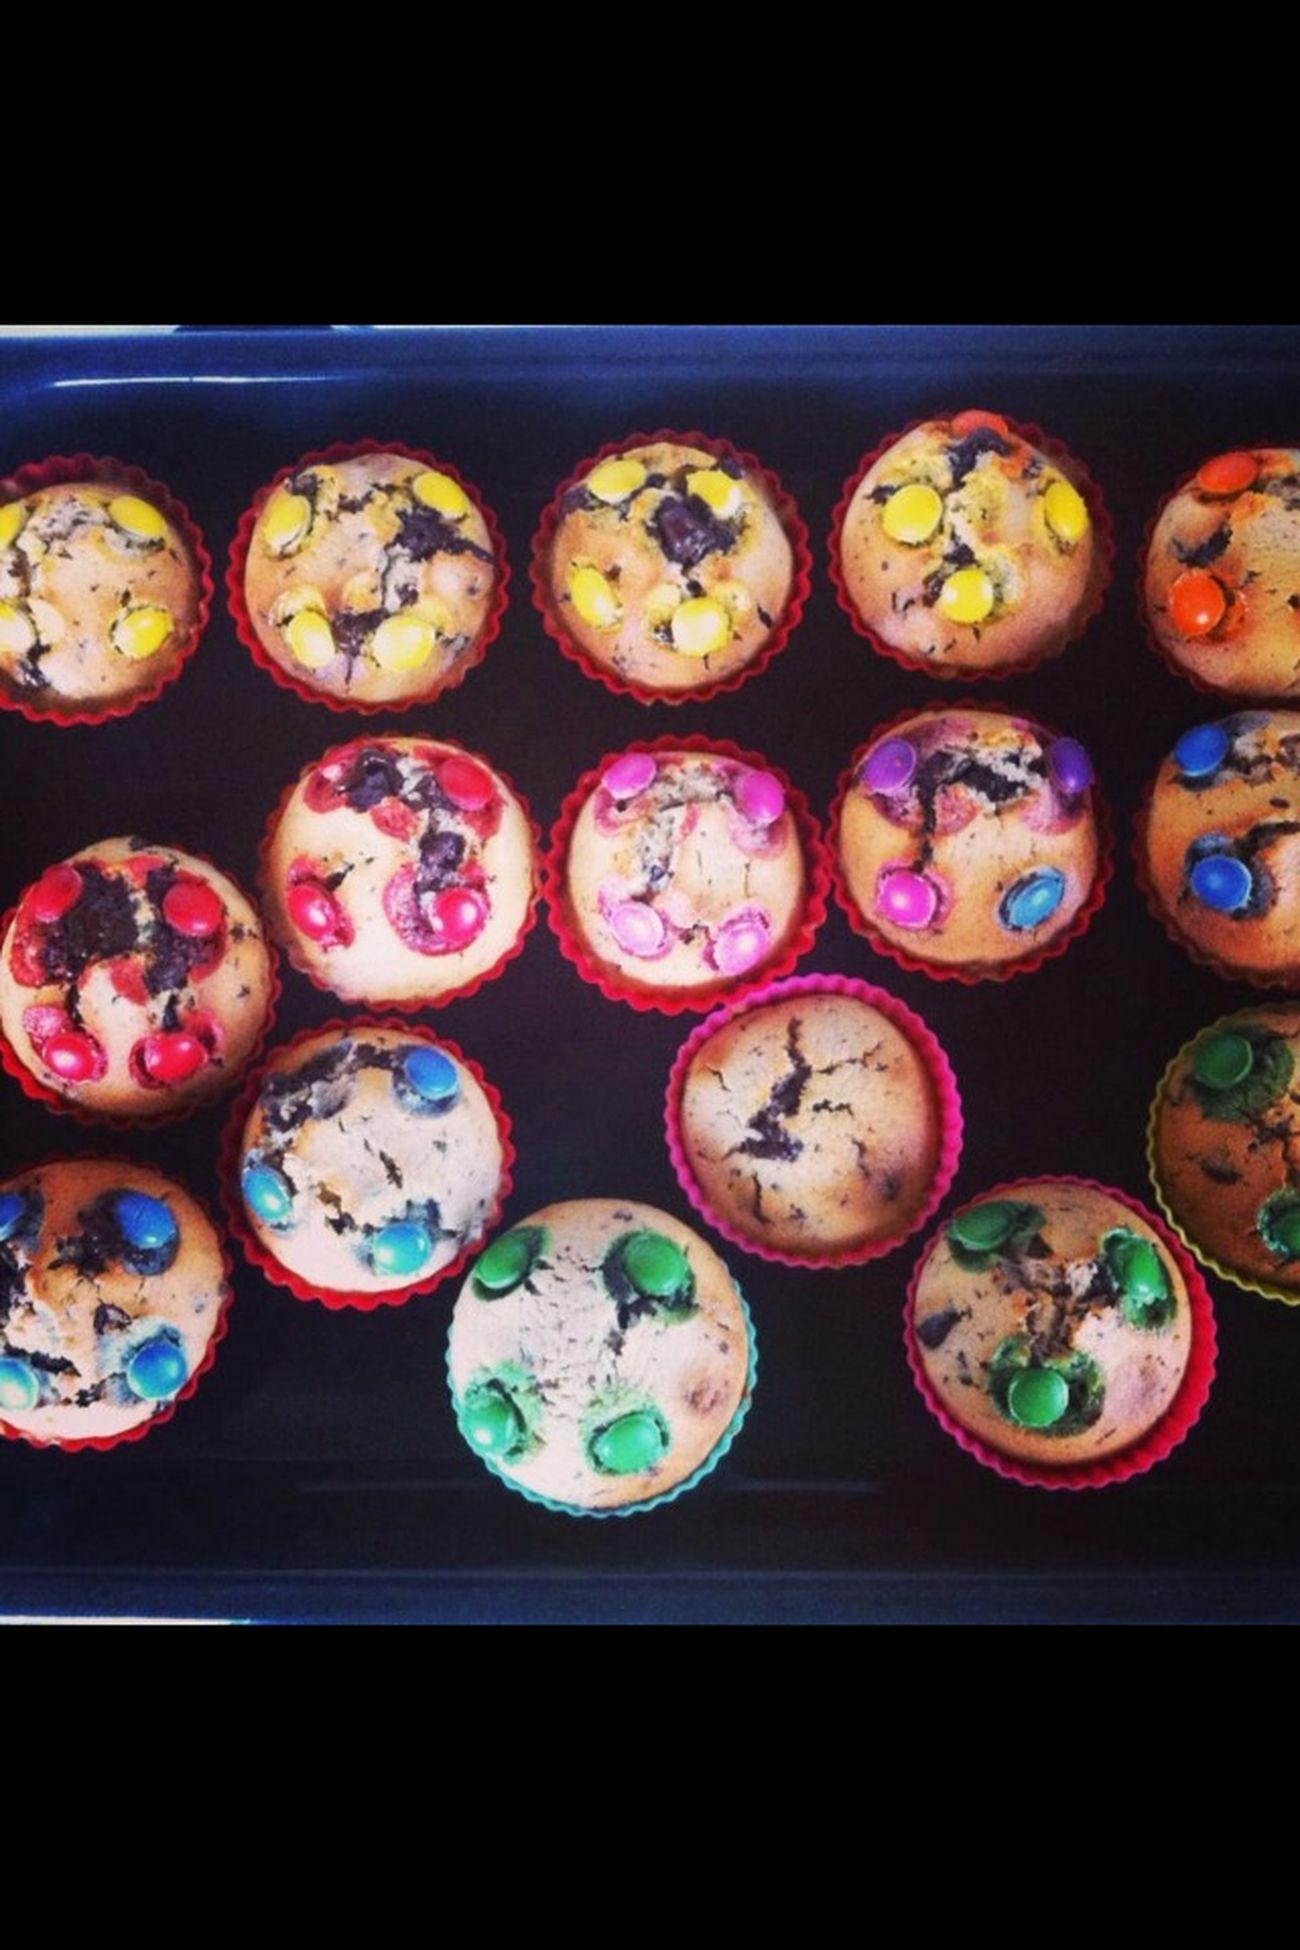 Thebest Cakes on the world :) i ´m fckn good Baker :) Colour